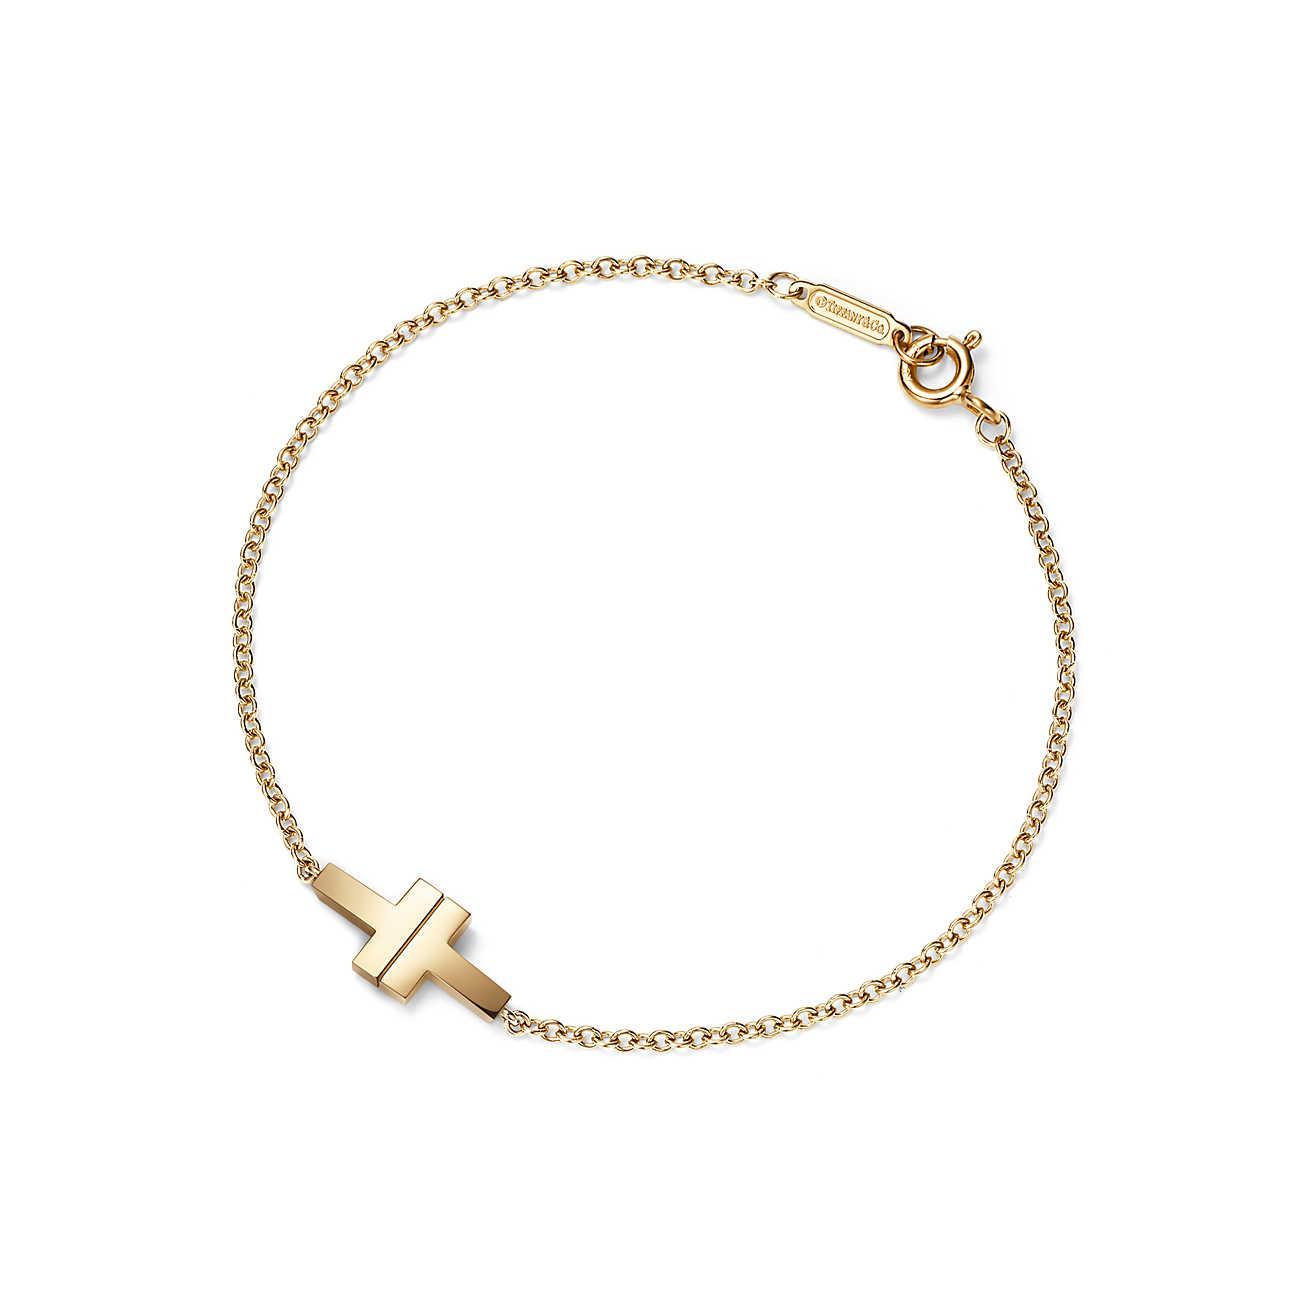 adb0c2d33b23 Tiffany   Co. Tiffany T Two Single Chain Bracelet In 18ct Gold ...